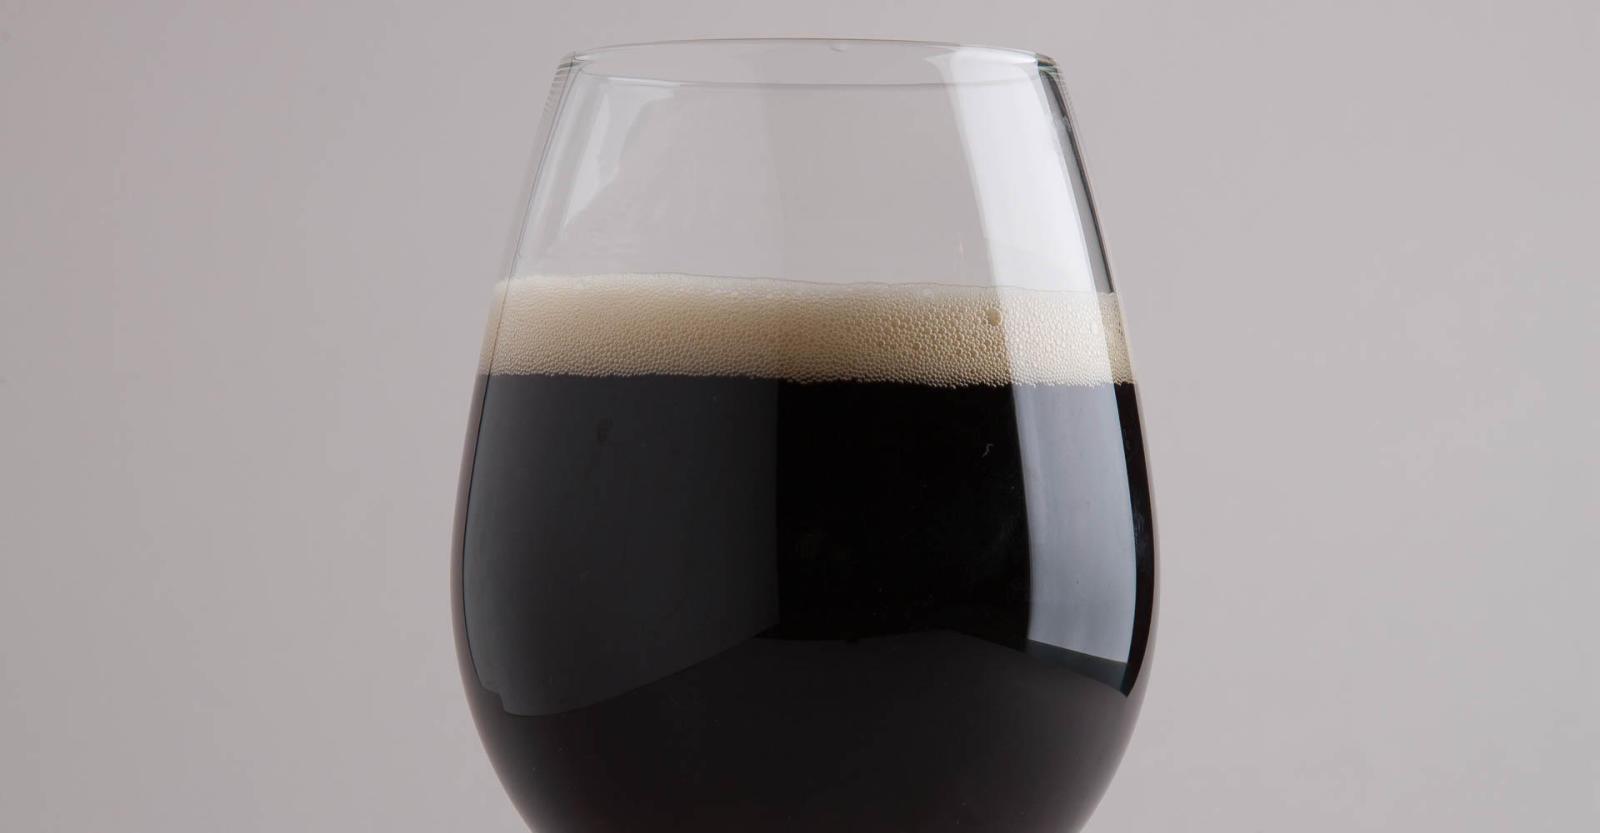 Make Your Best Baltic Porter Craft Beer Brewing